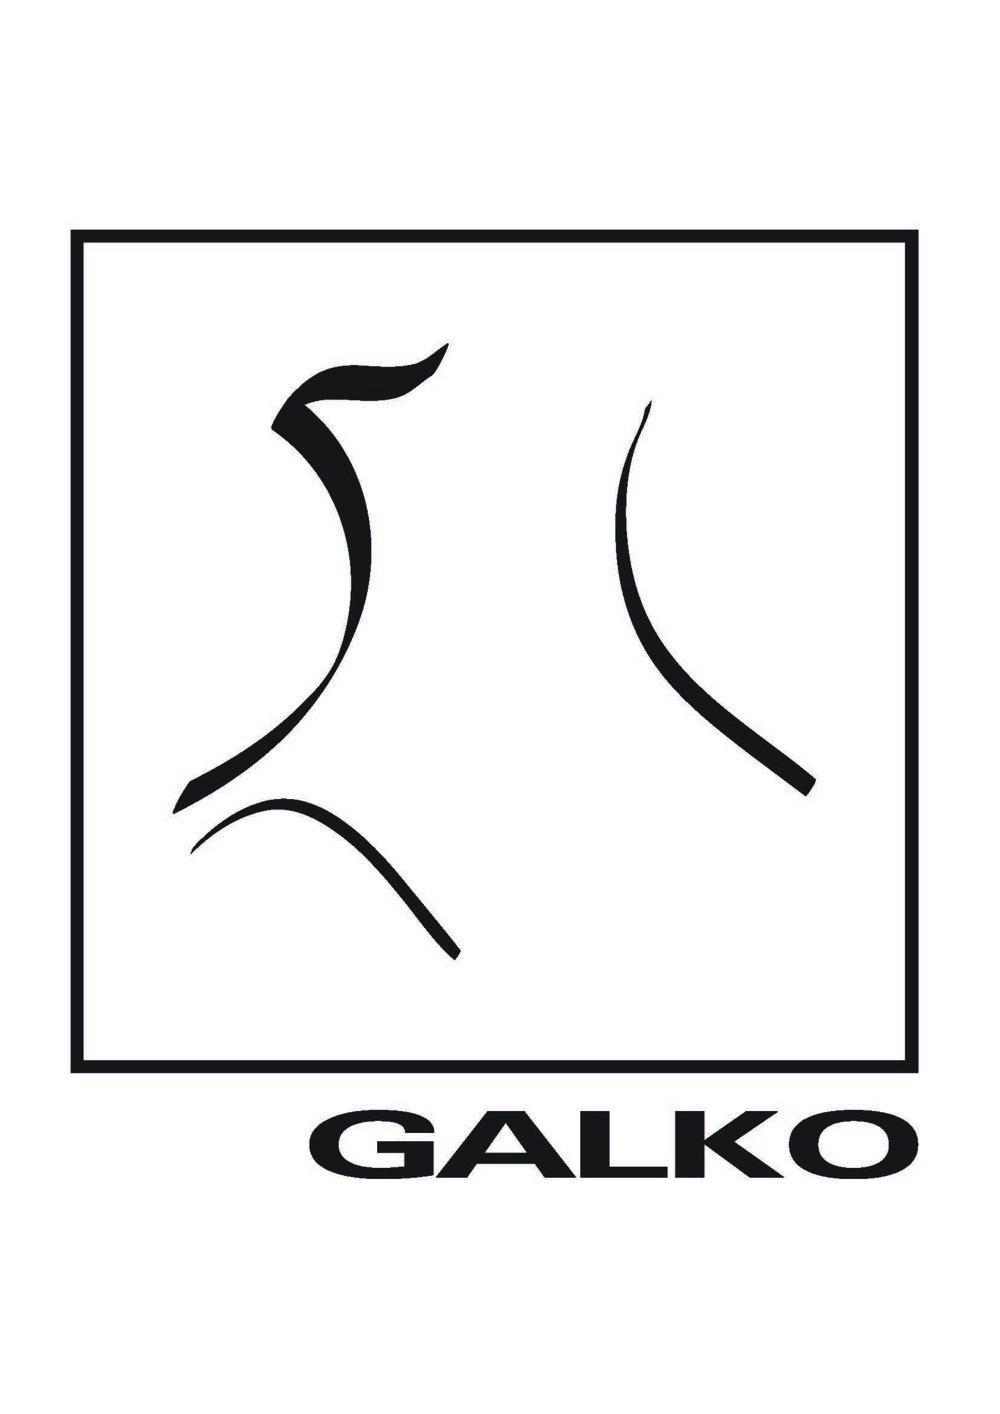 Galko_Logo.jpg